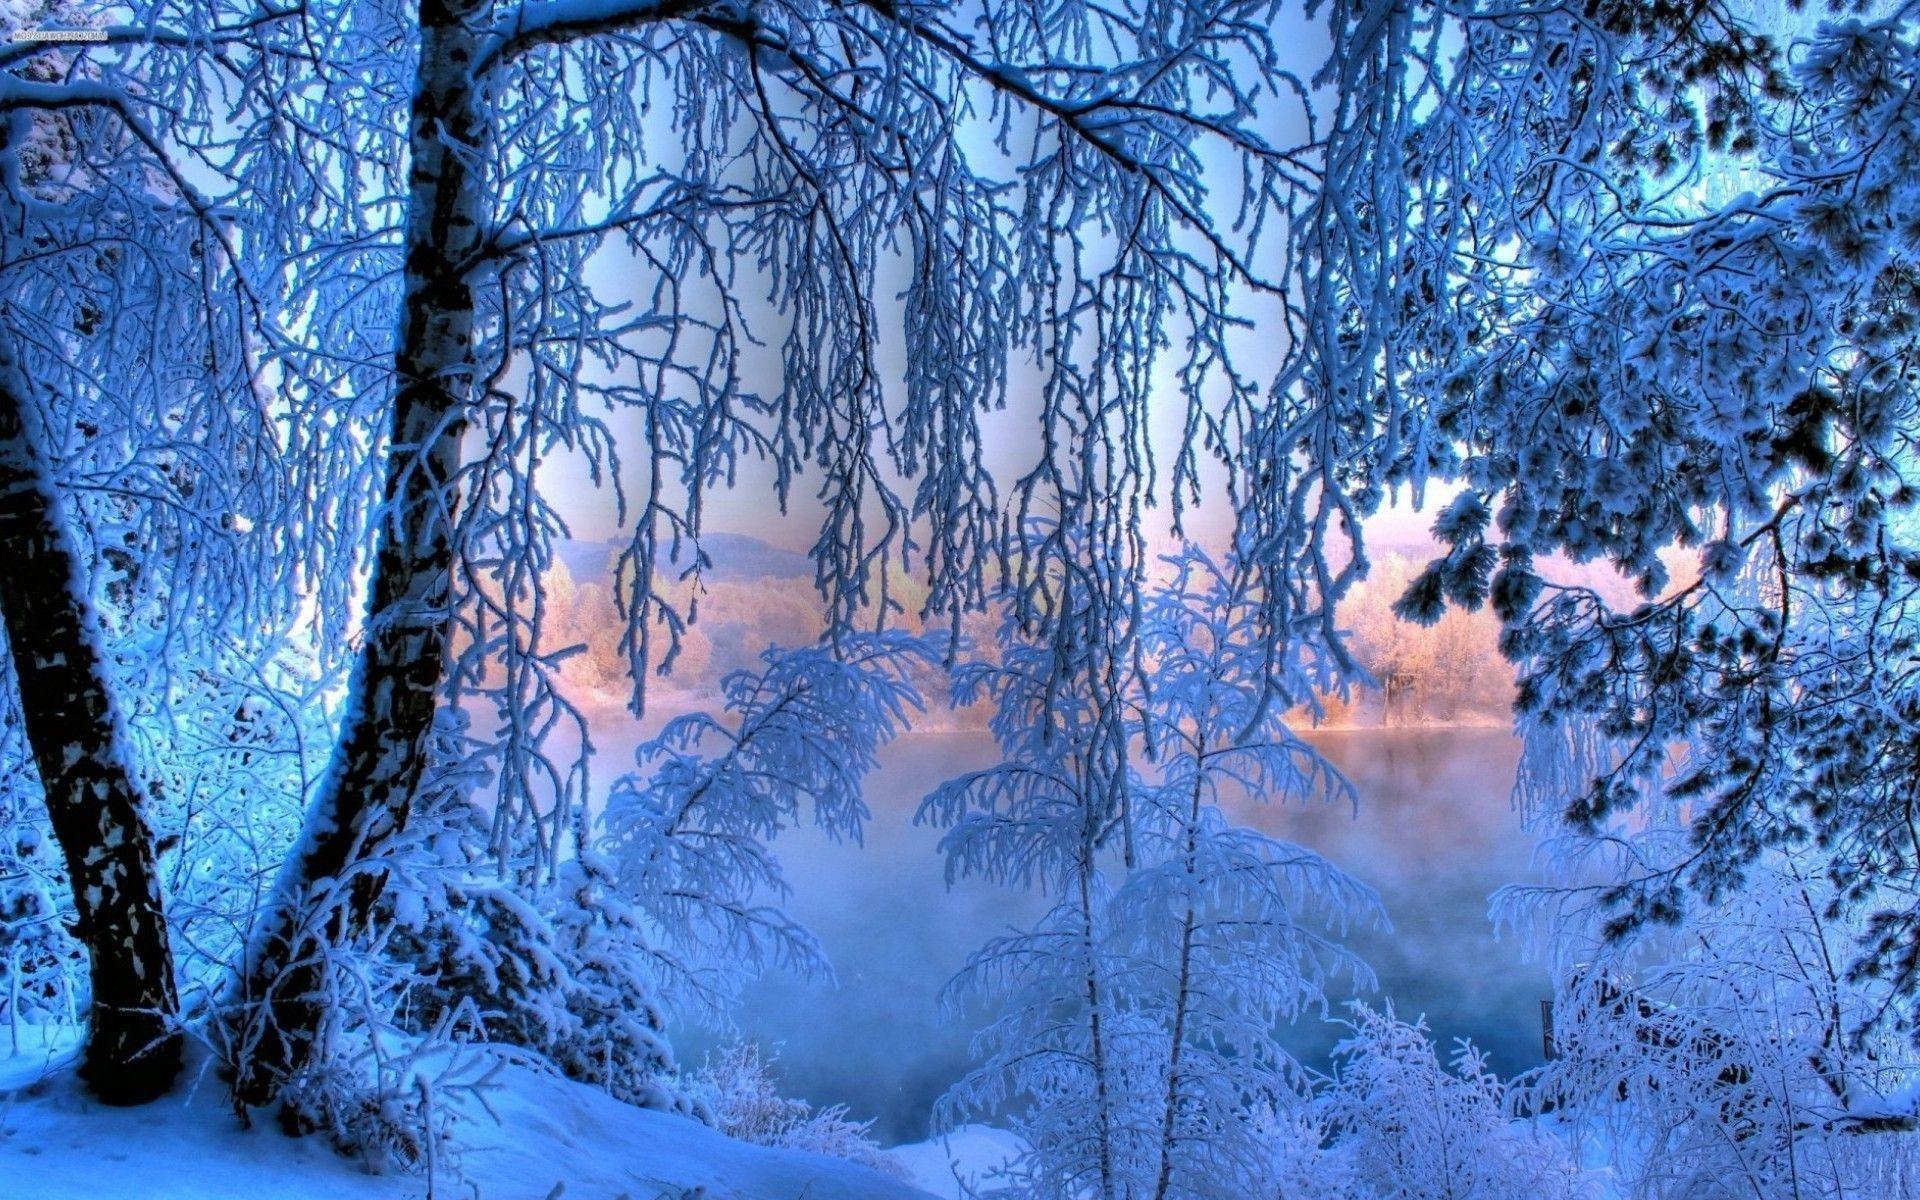 озеро зима иней the lake winter frost  № 580145 загрузить